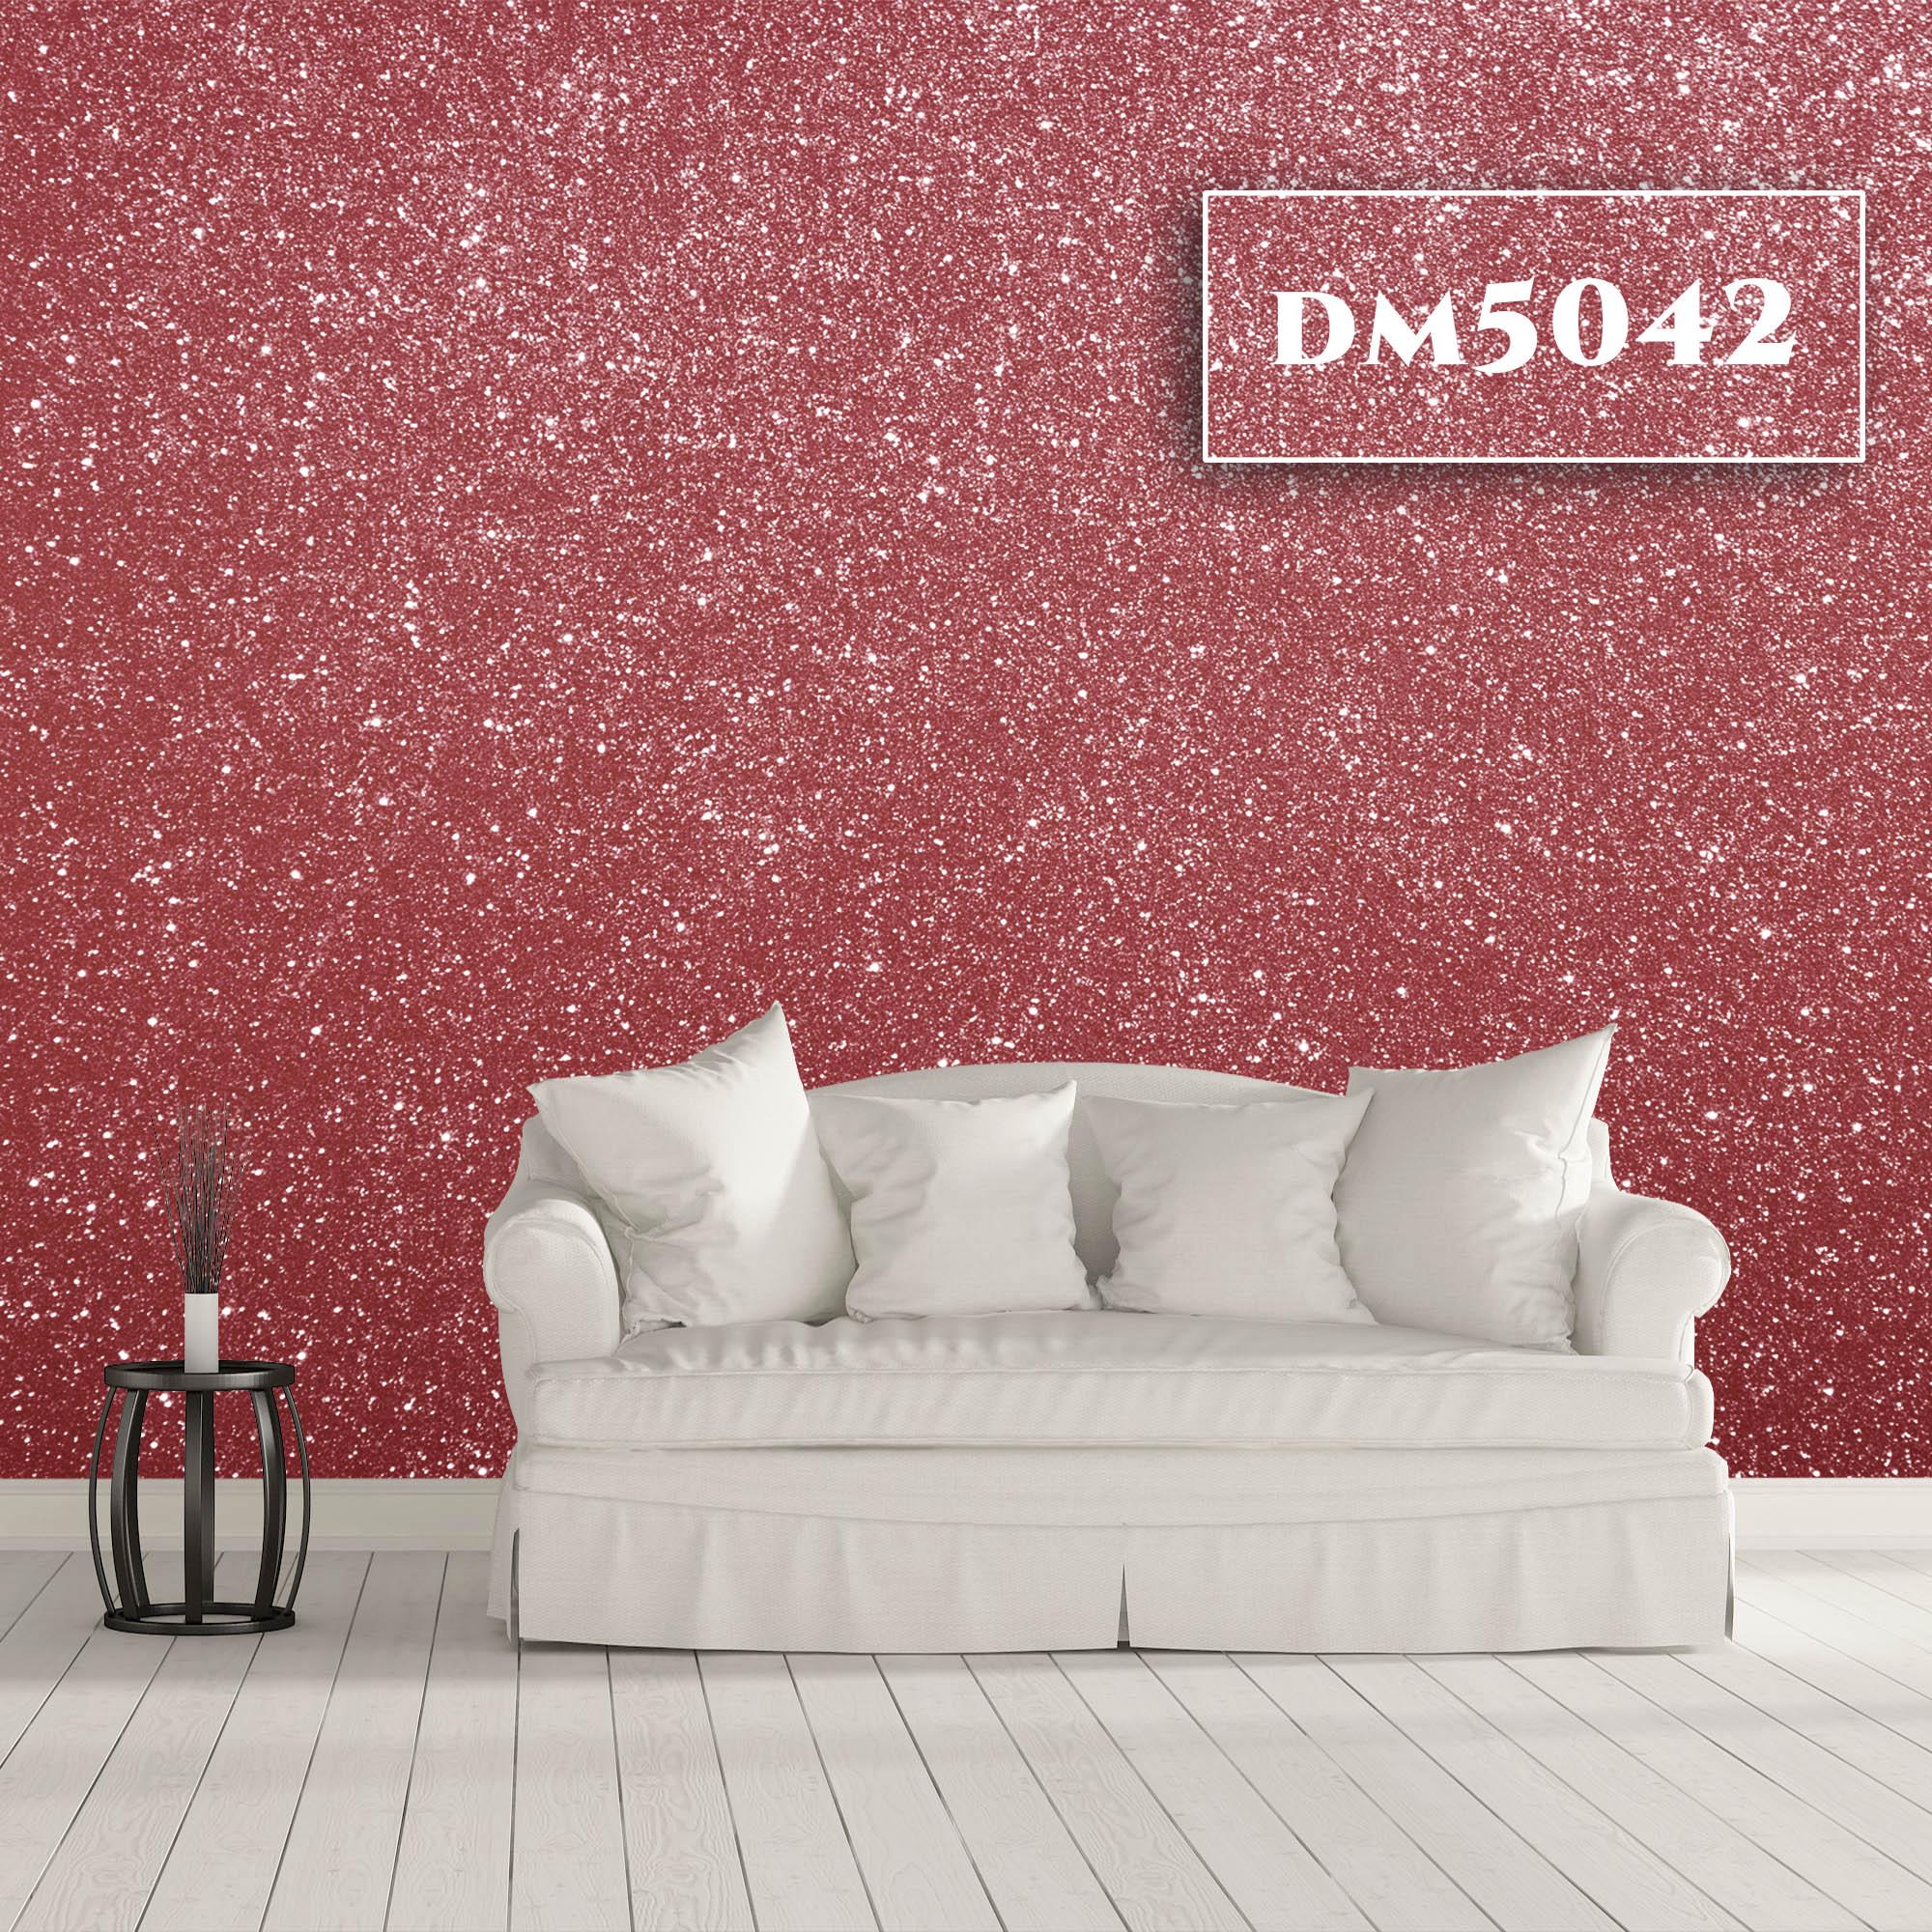 DM5042